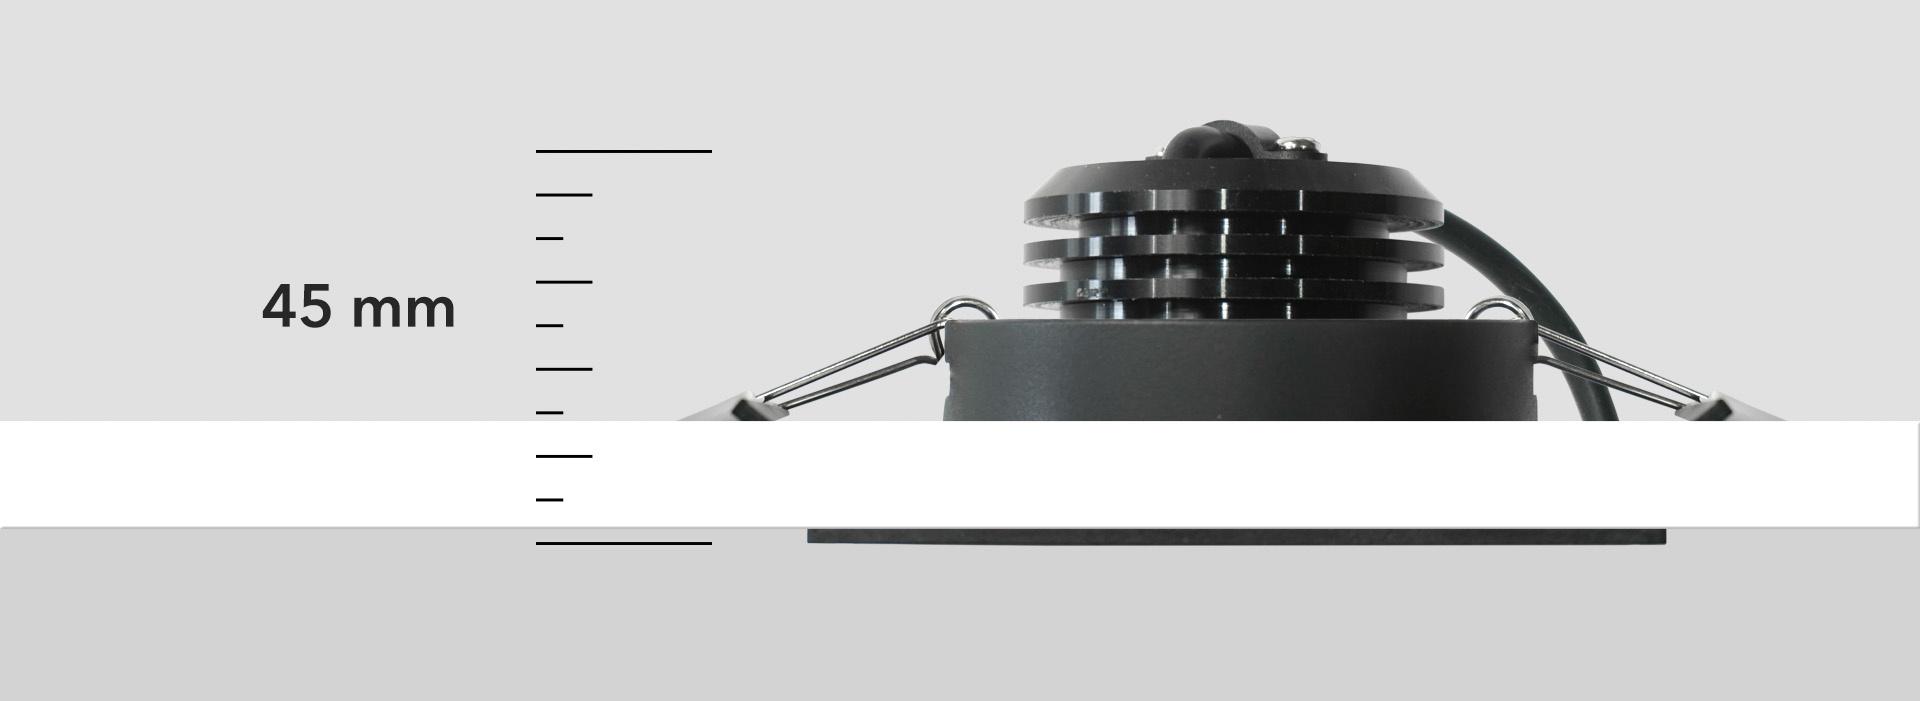 FLEXX-tiltable-recessed-led-spot-light-round-square-black-white-gold-inox